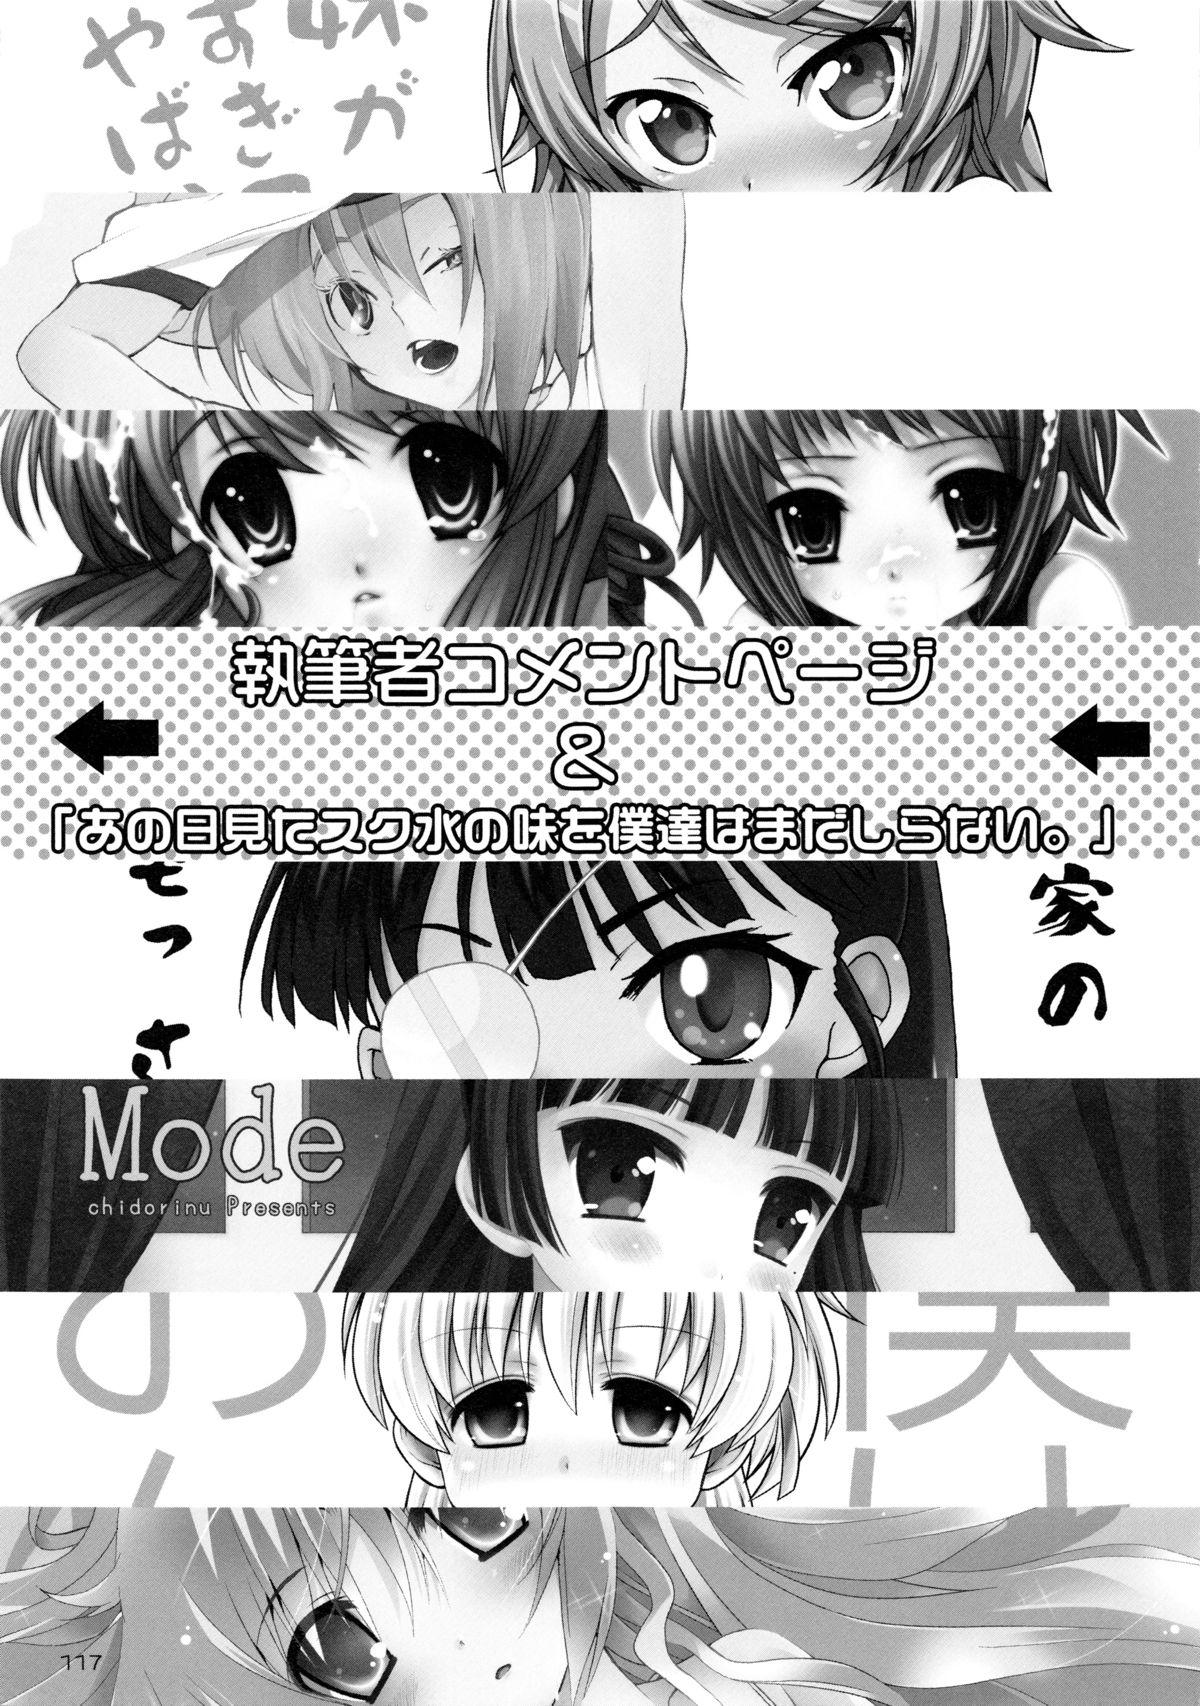 School-mer! School Mizugi Bloomer Joshi Anthology 117